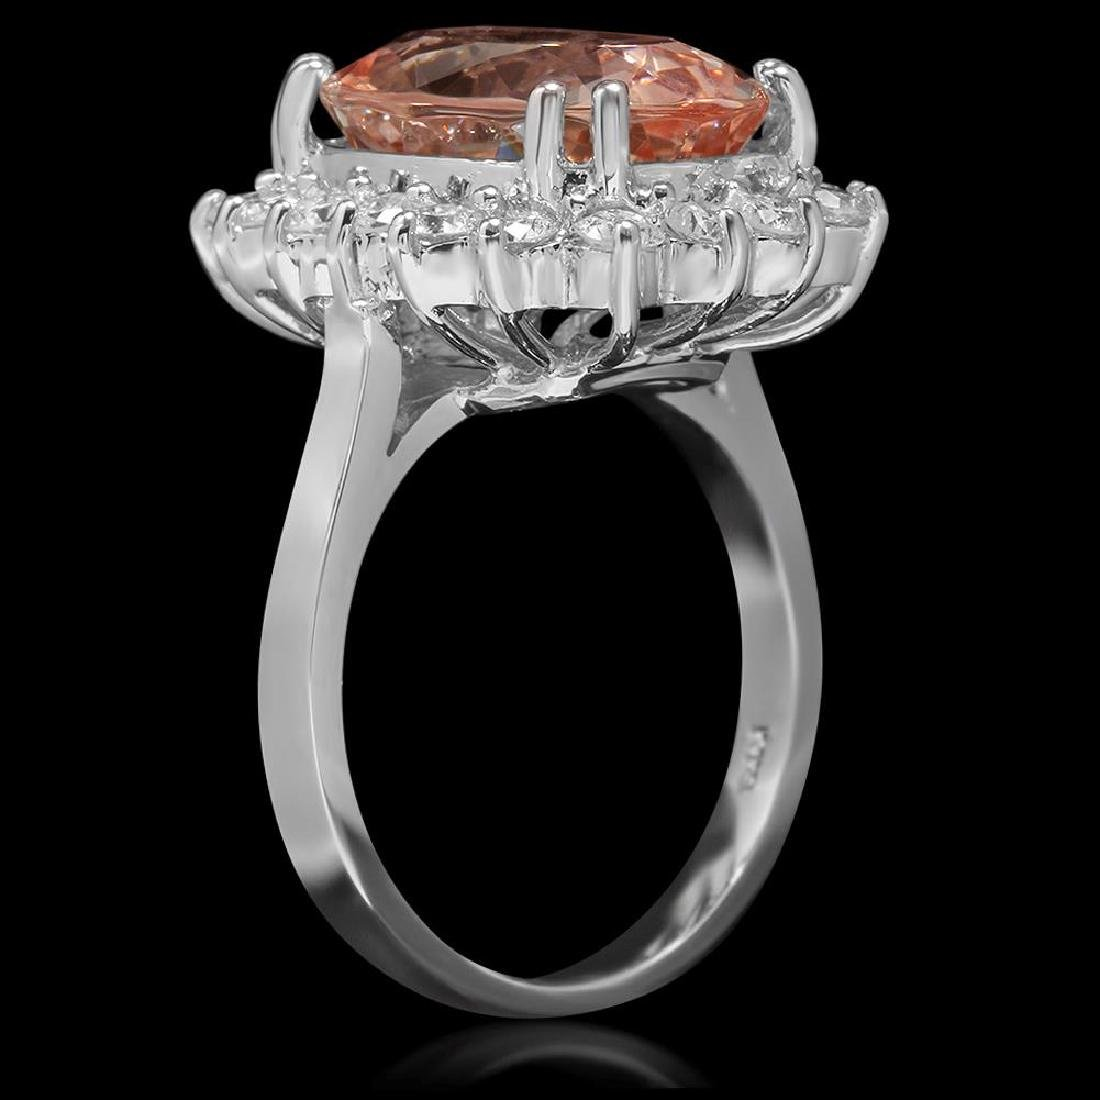 14K Gold 6.23ct Morganite 1.16ct Diamond Ring - 2